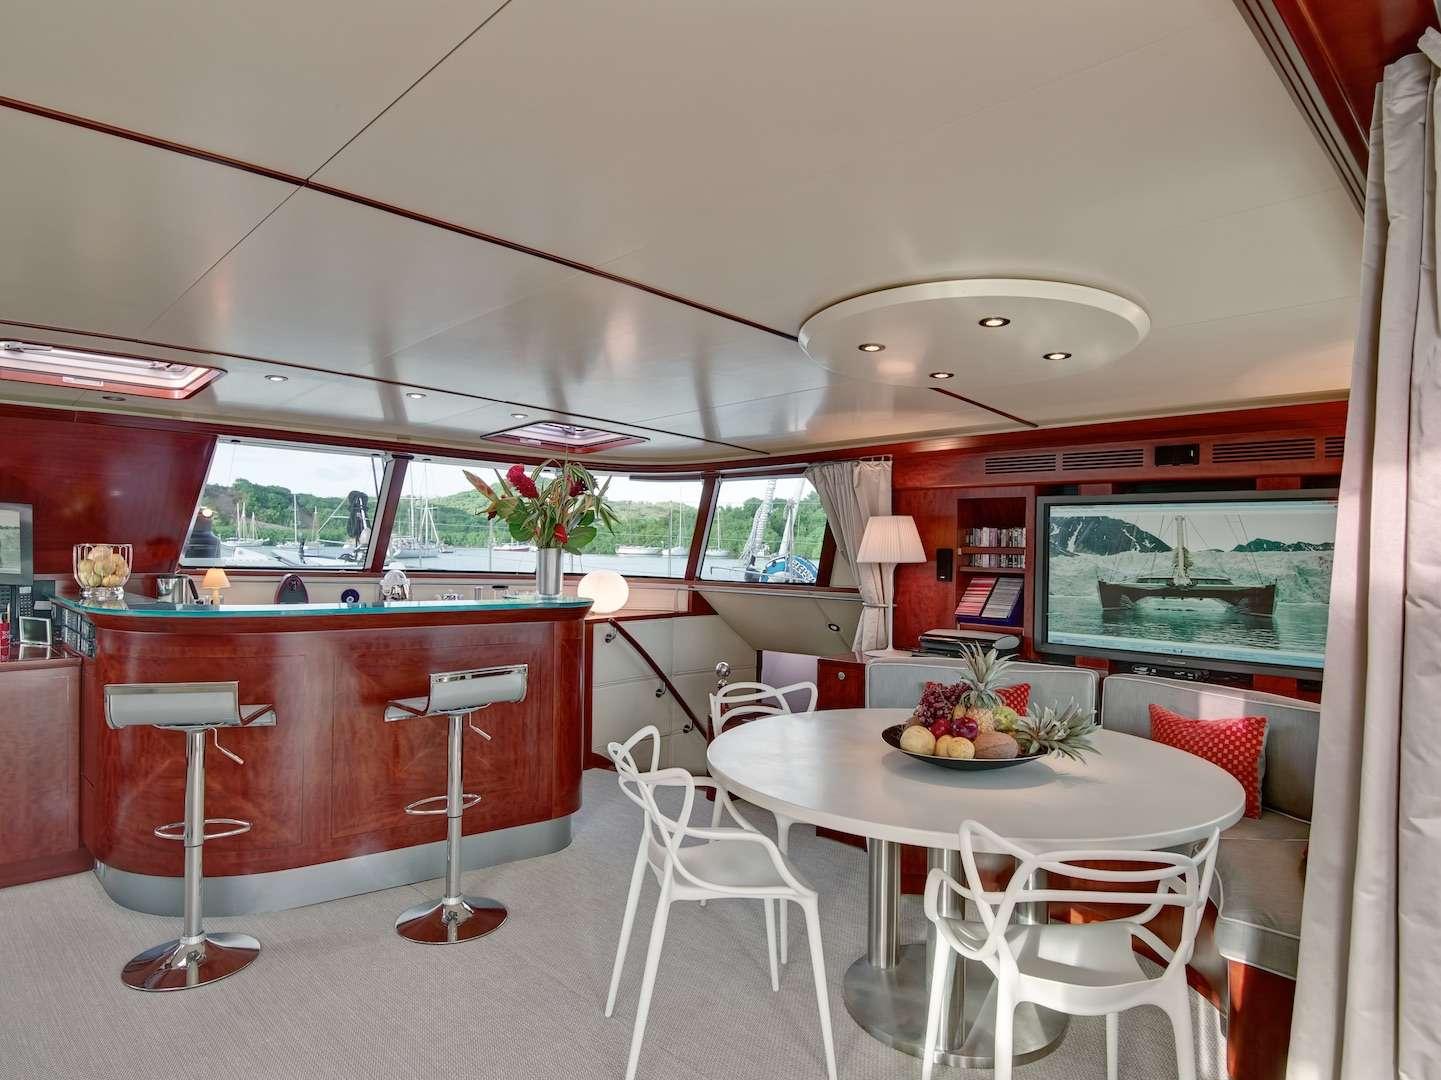 Cat Yacht 'Cat', 6 PAX, 3 Crew, 84.00 Ft, 25.00 Meters, Built 2004, JFA Chantier Naval, Refit Year 2012